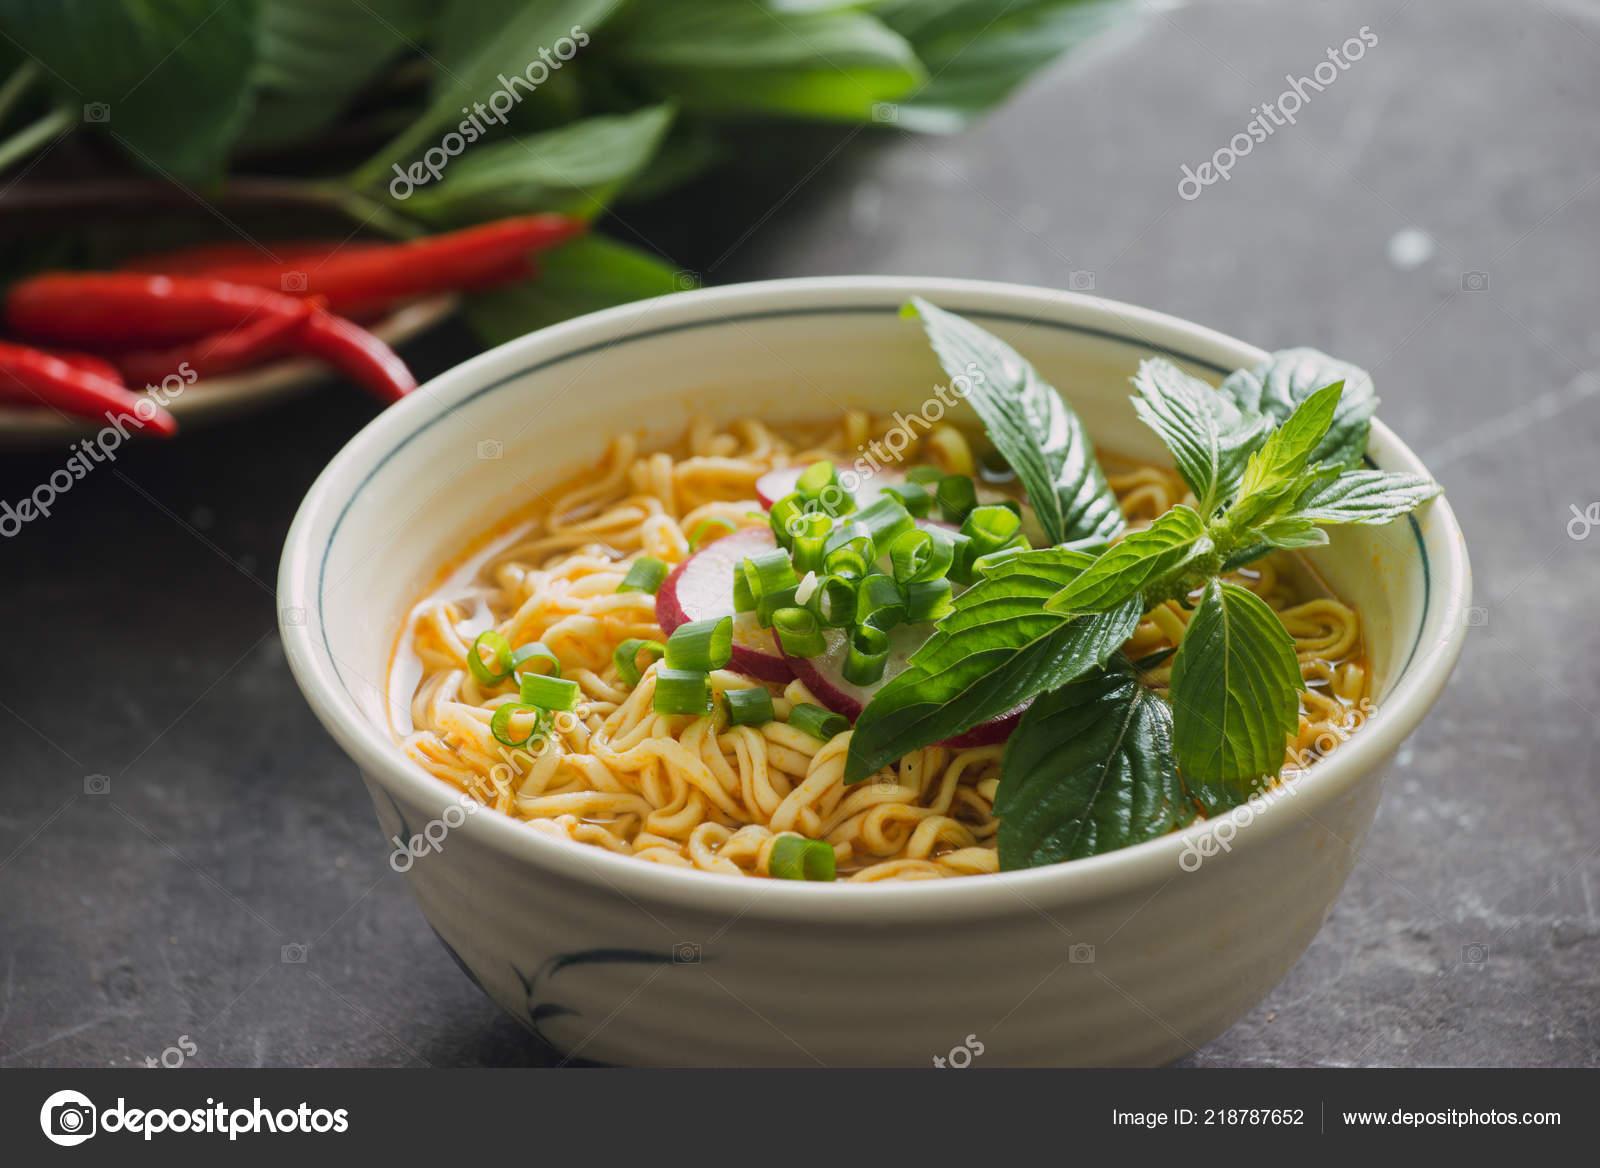 Instant Noodles Bowl Fresh Herbs Garnish Cilantro Asian